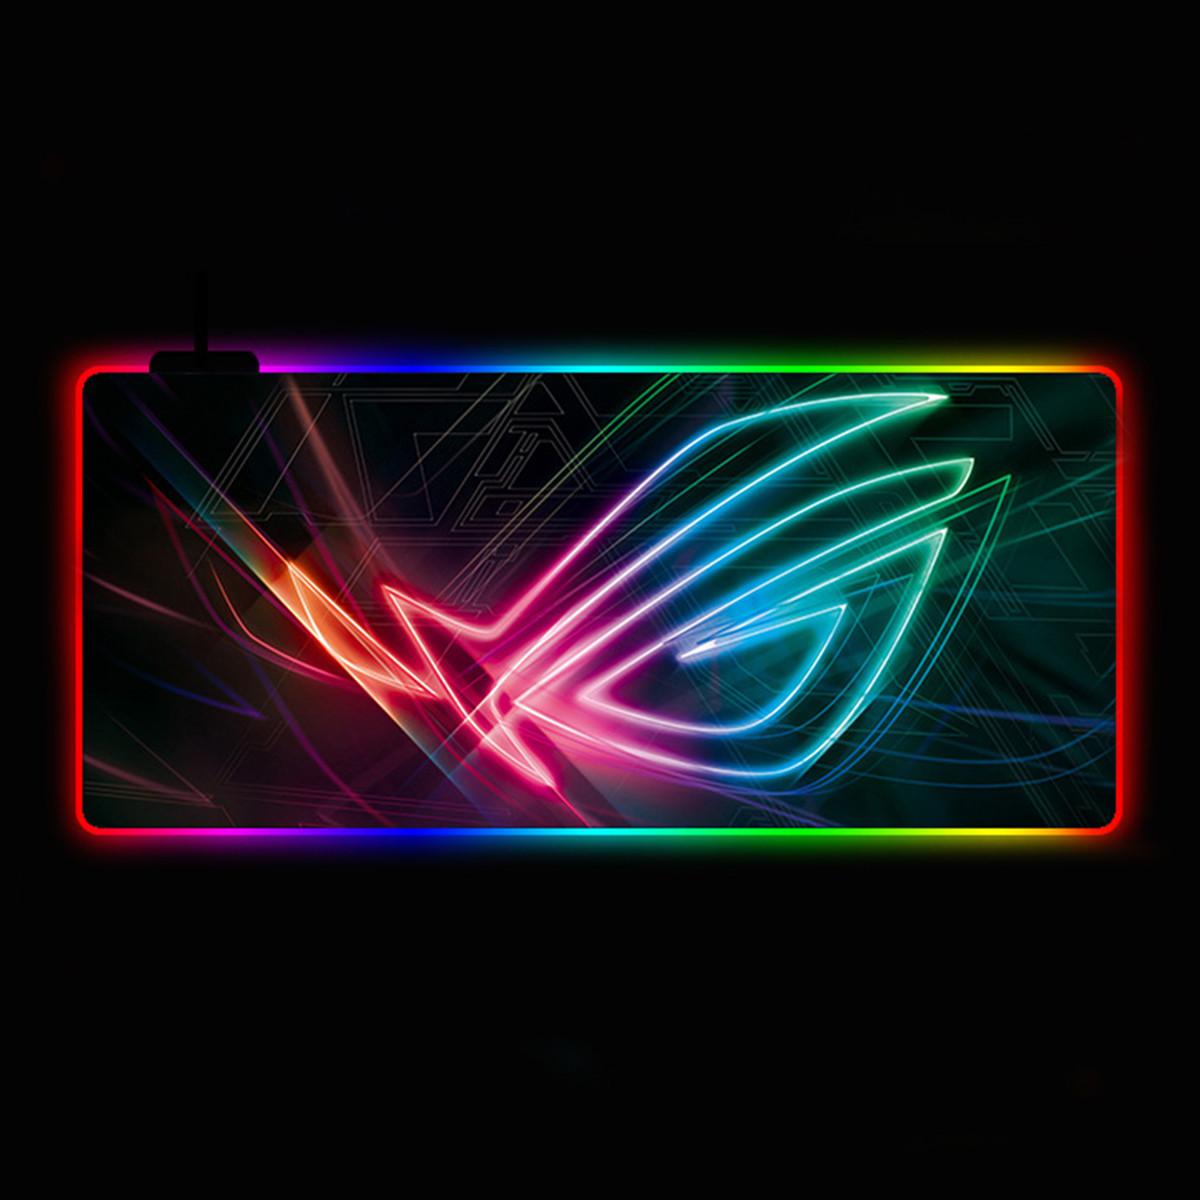 Геймерский коврик для мышки SKY (GMS-WT 9040/105) RGB подсветка 90x40 см